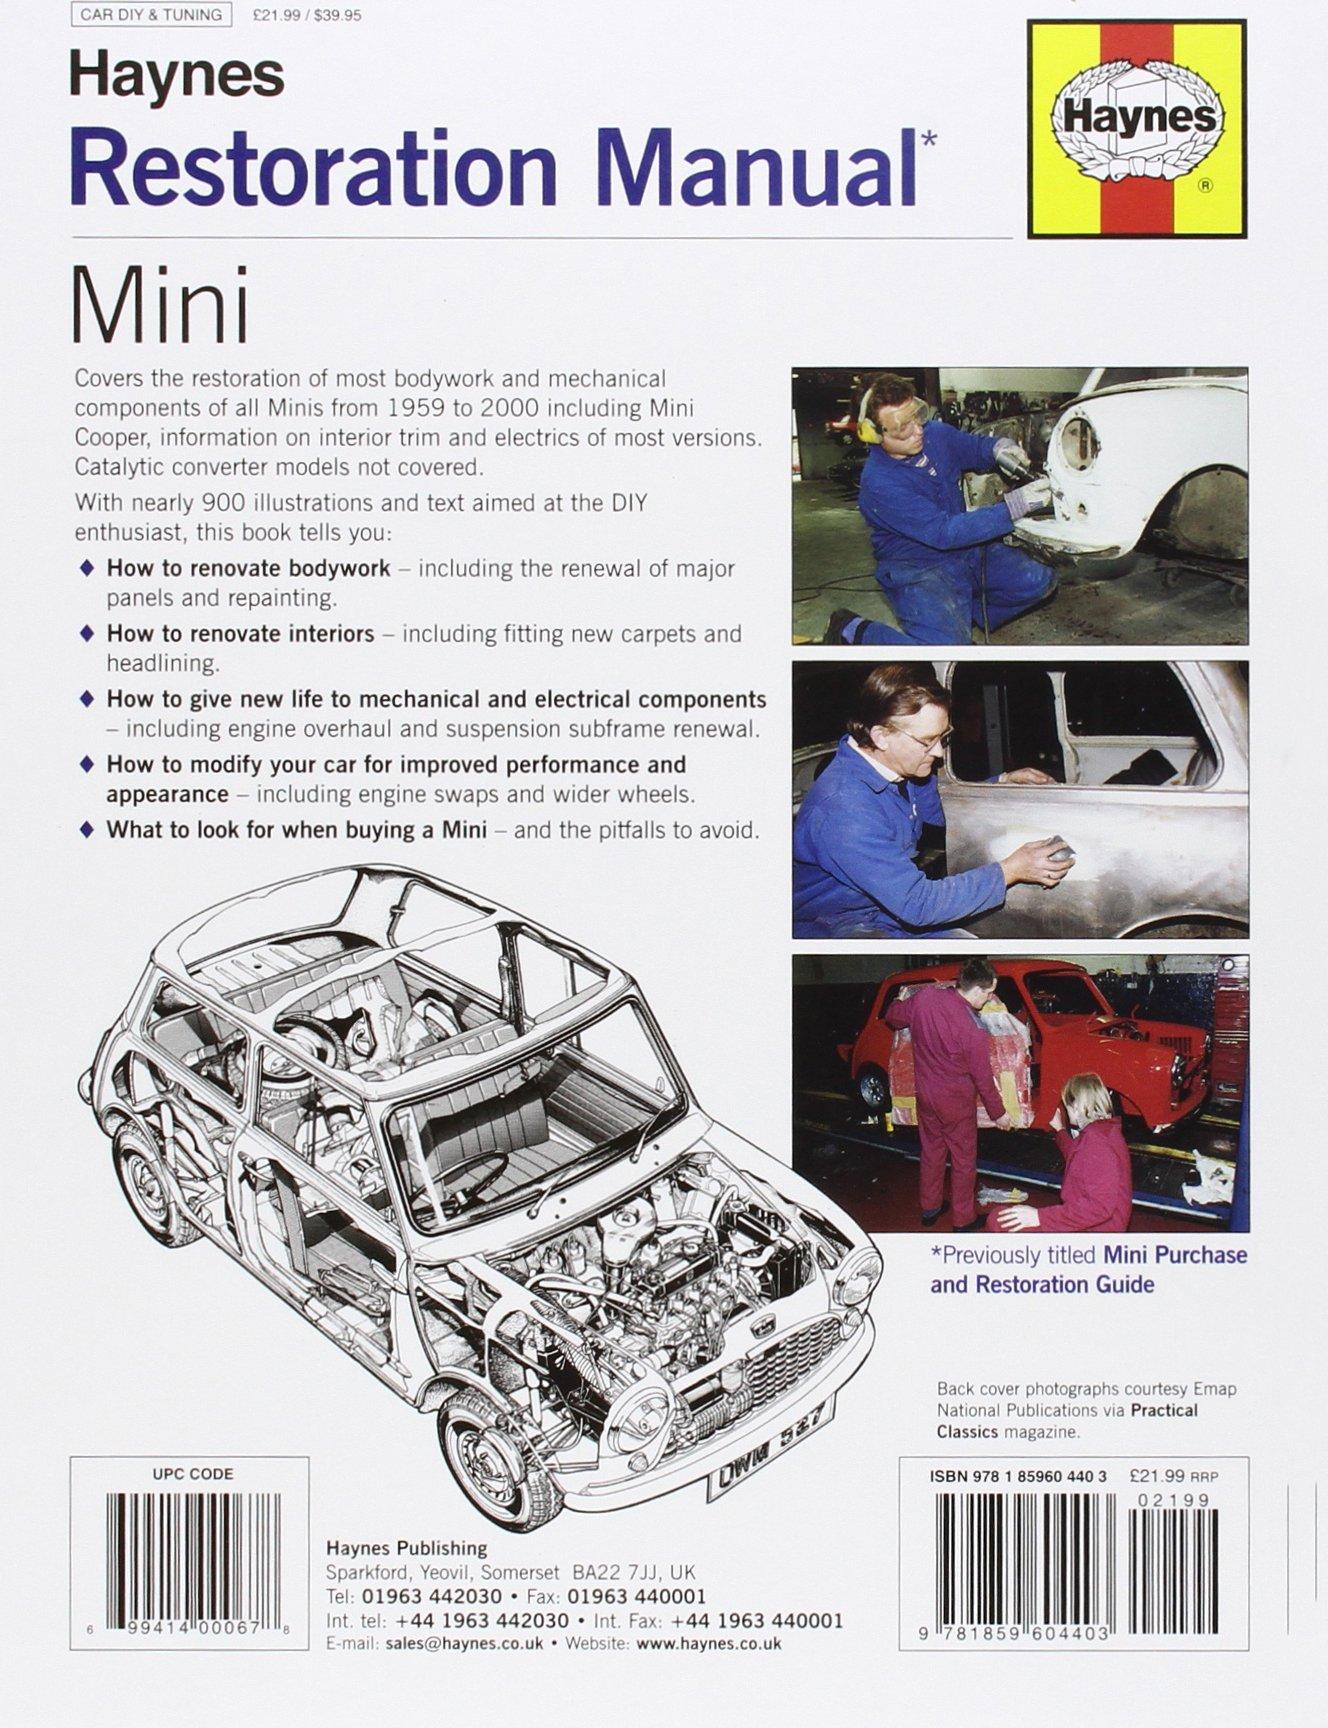 mini restoration manual lindsay porter 9781859604403 books rh amazon ca the ultimate mini restoration manual pdf haynes mini restoration manual pdf